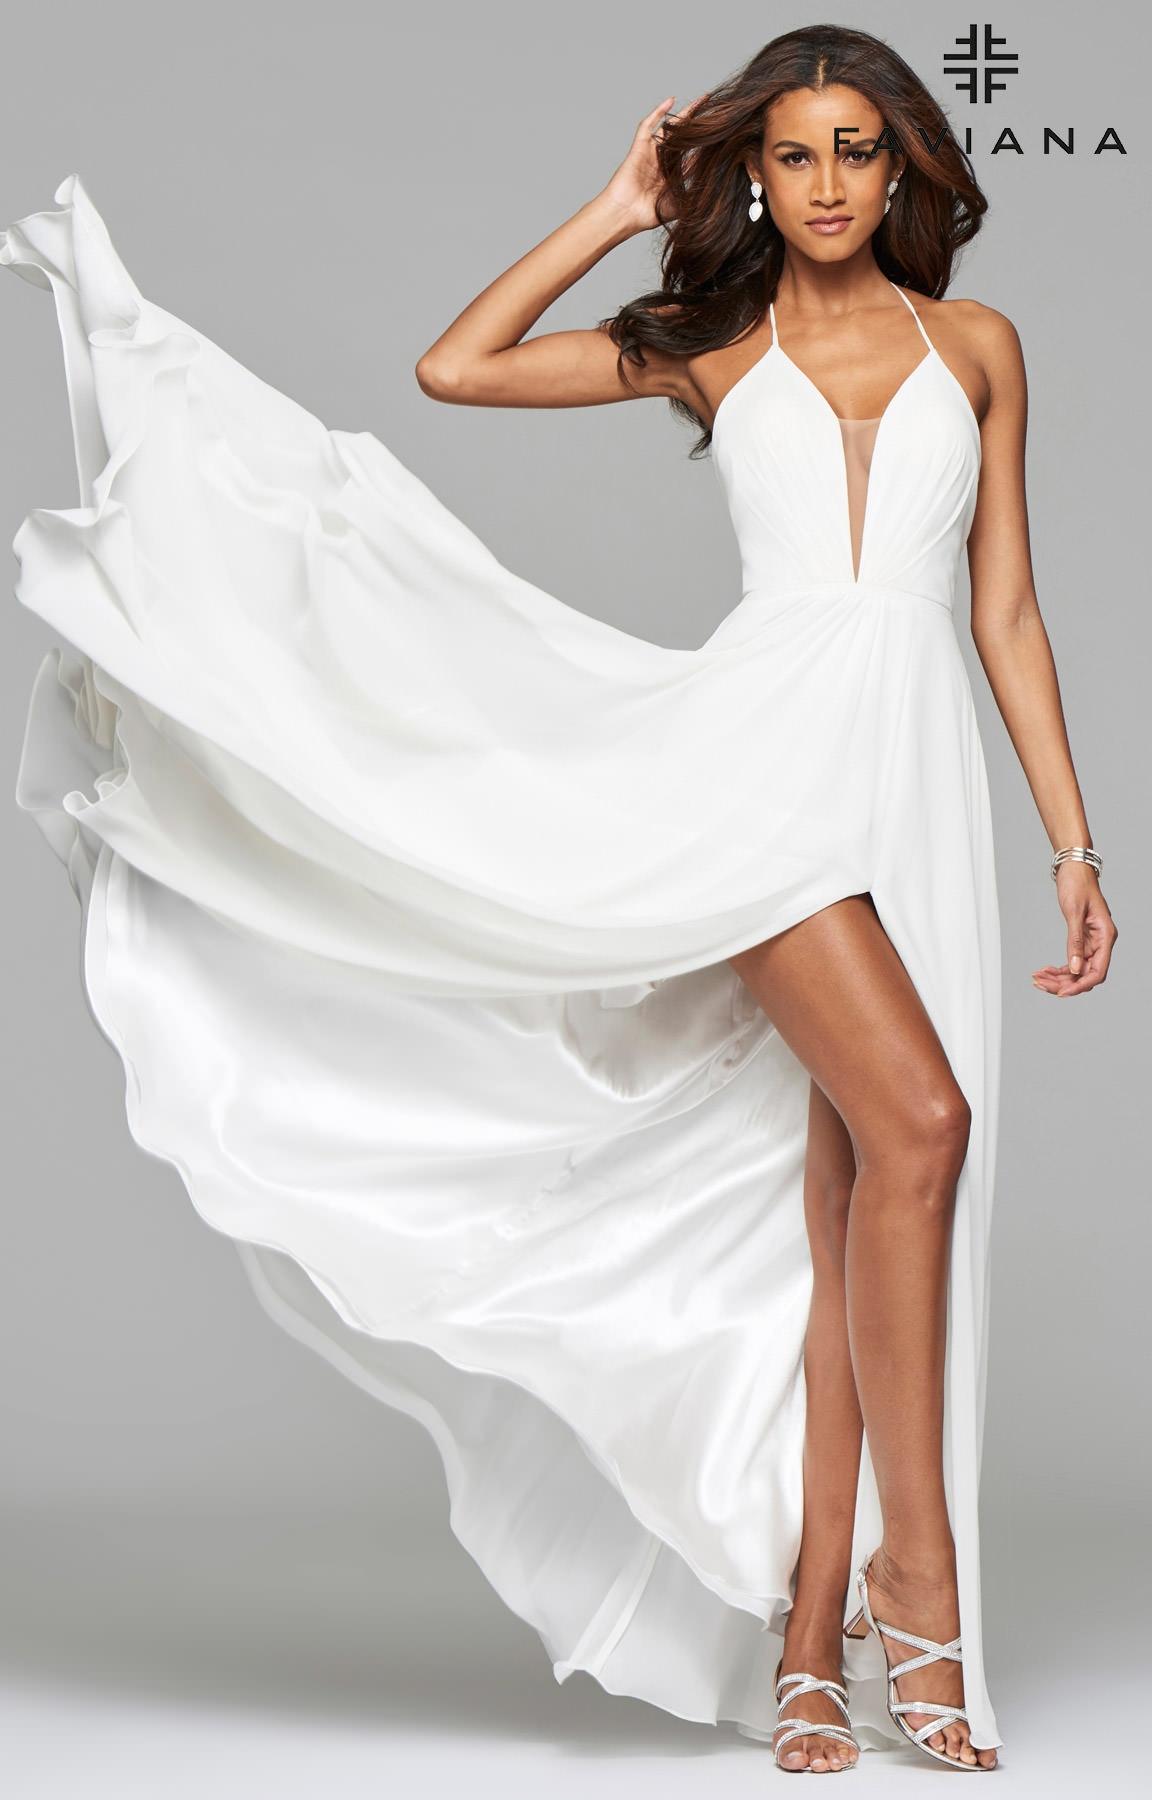 Faviana 7747 - Open Corset Back Dress with Low Neckline Prom Dress